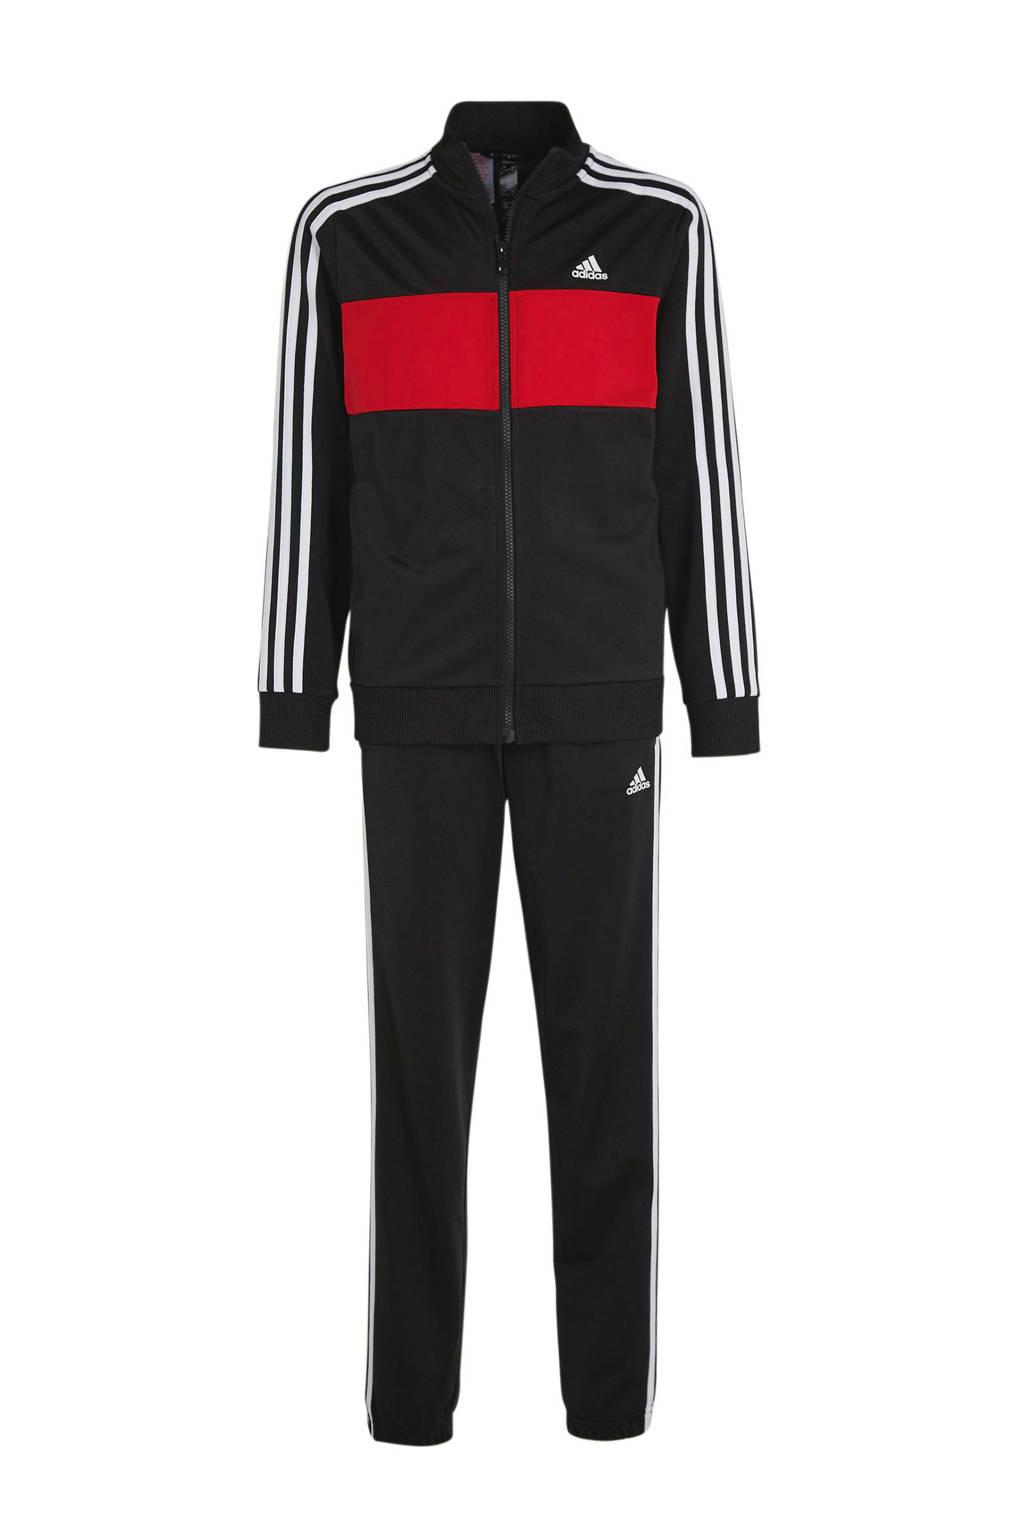 adidas Performance   performance trainingspak zwart/rood, Zwart/rood